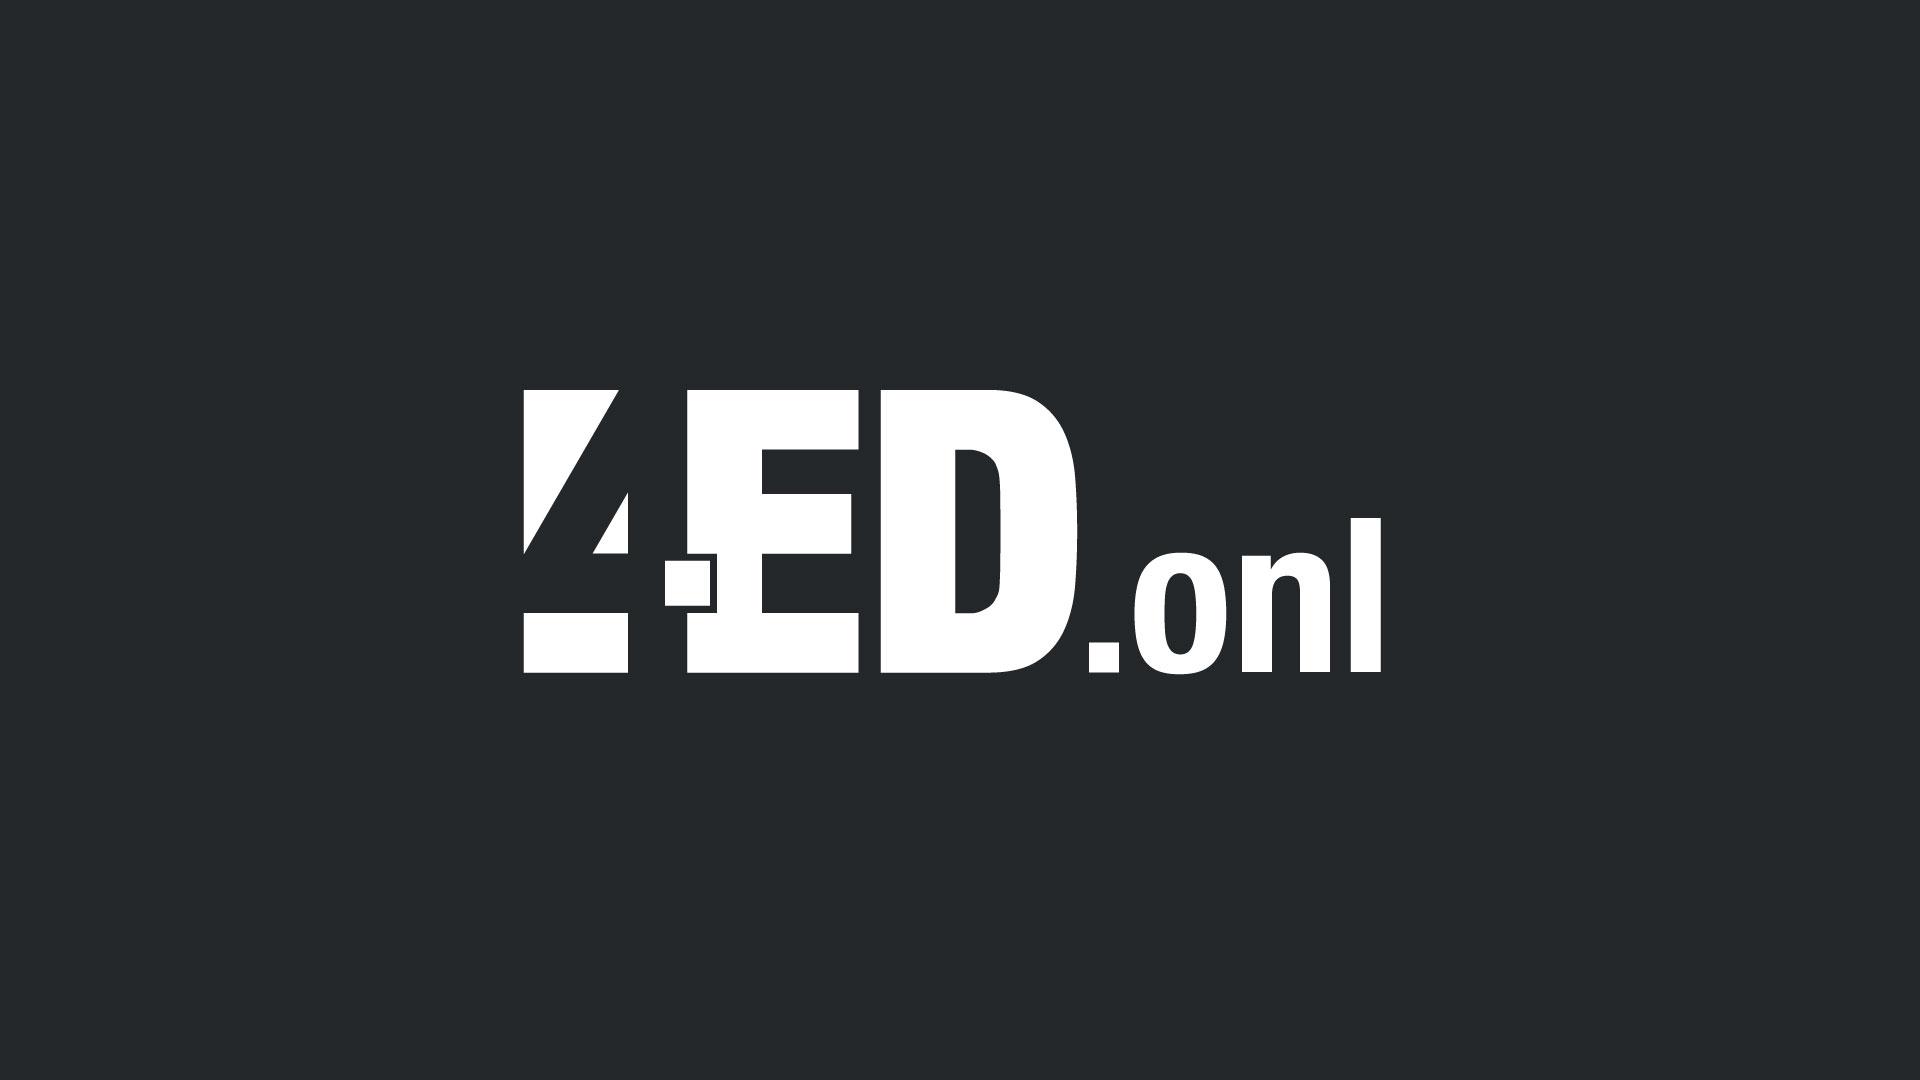 4ED onl - Cursos Online por videochamadas individuais